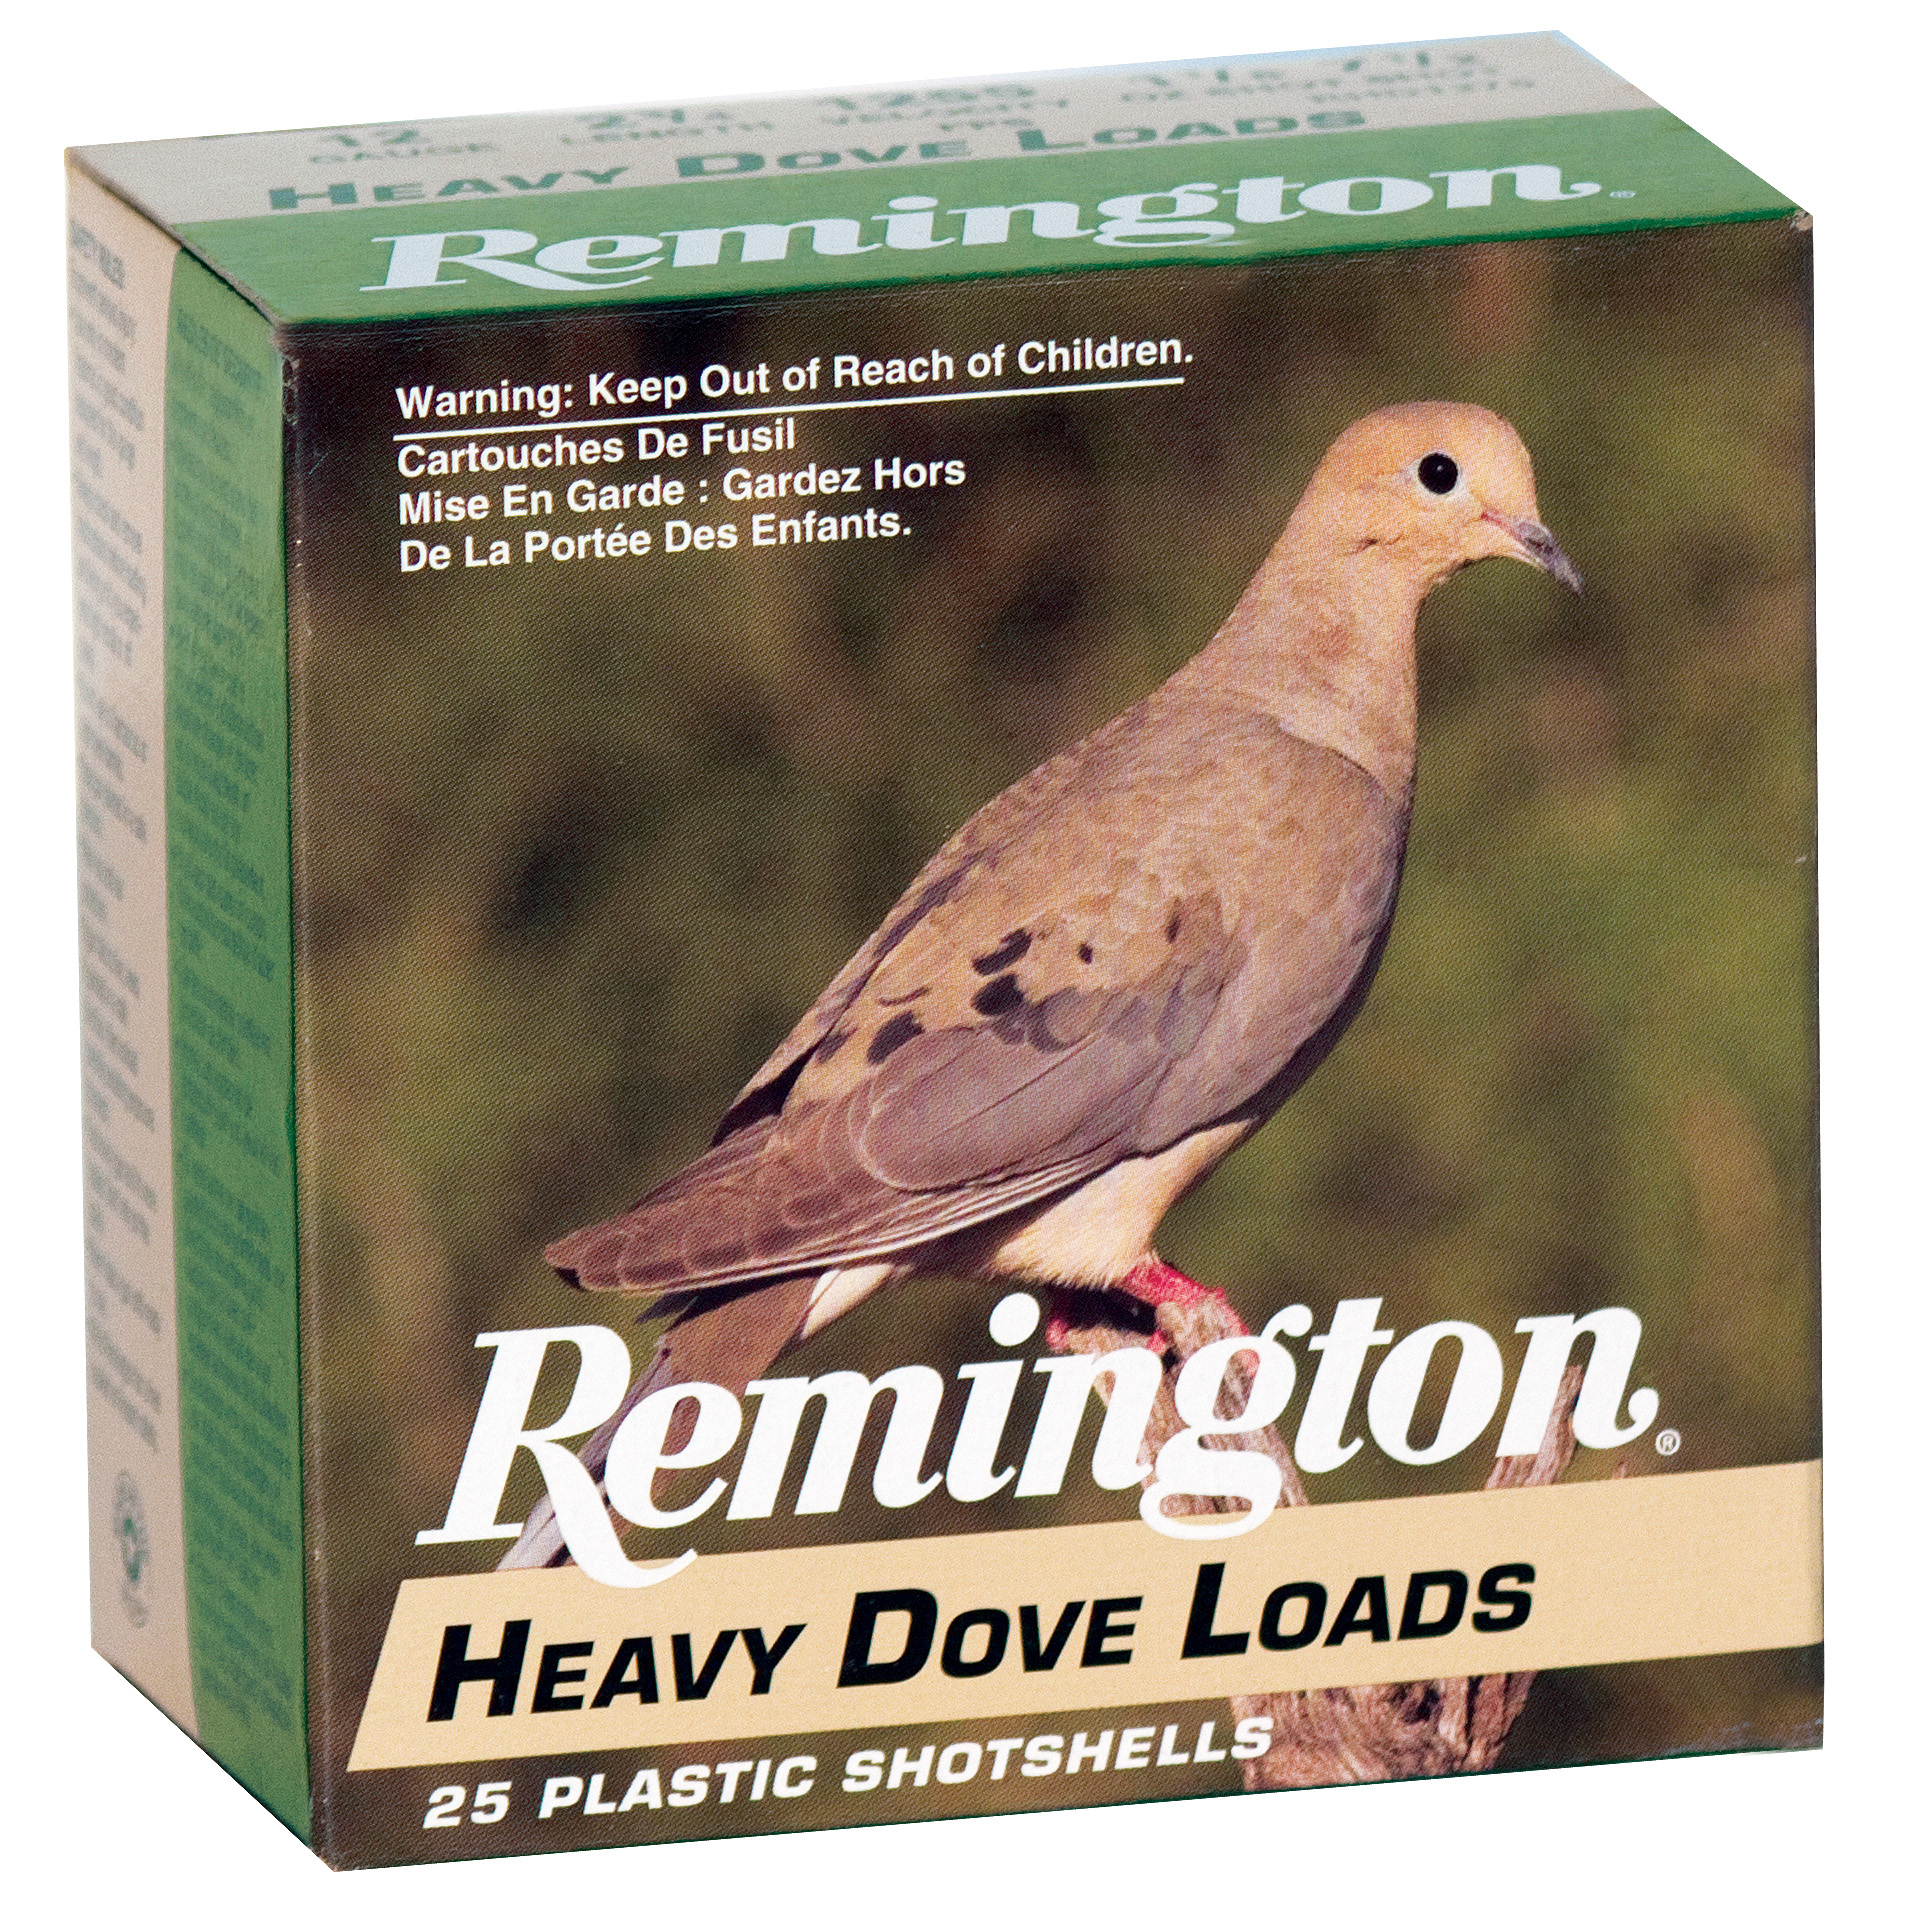 Remington Heavy Dove Ammo, 12-ga, 2-3/4″, 1-1/8 oz.